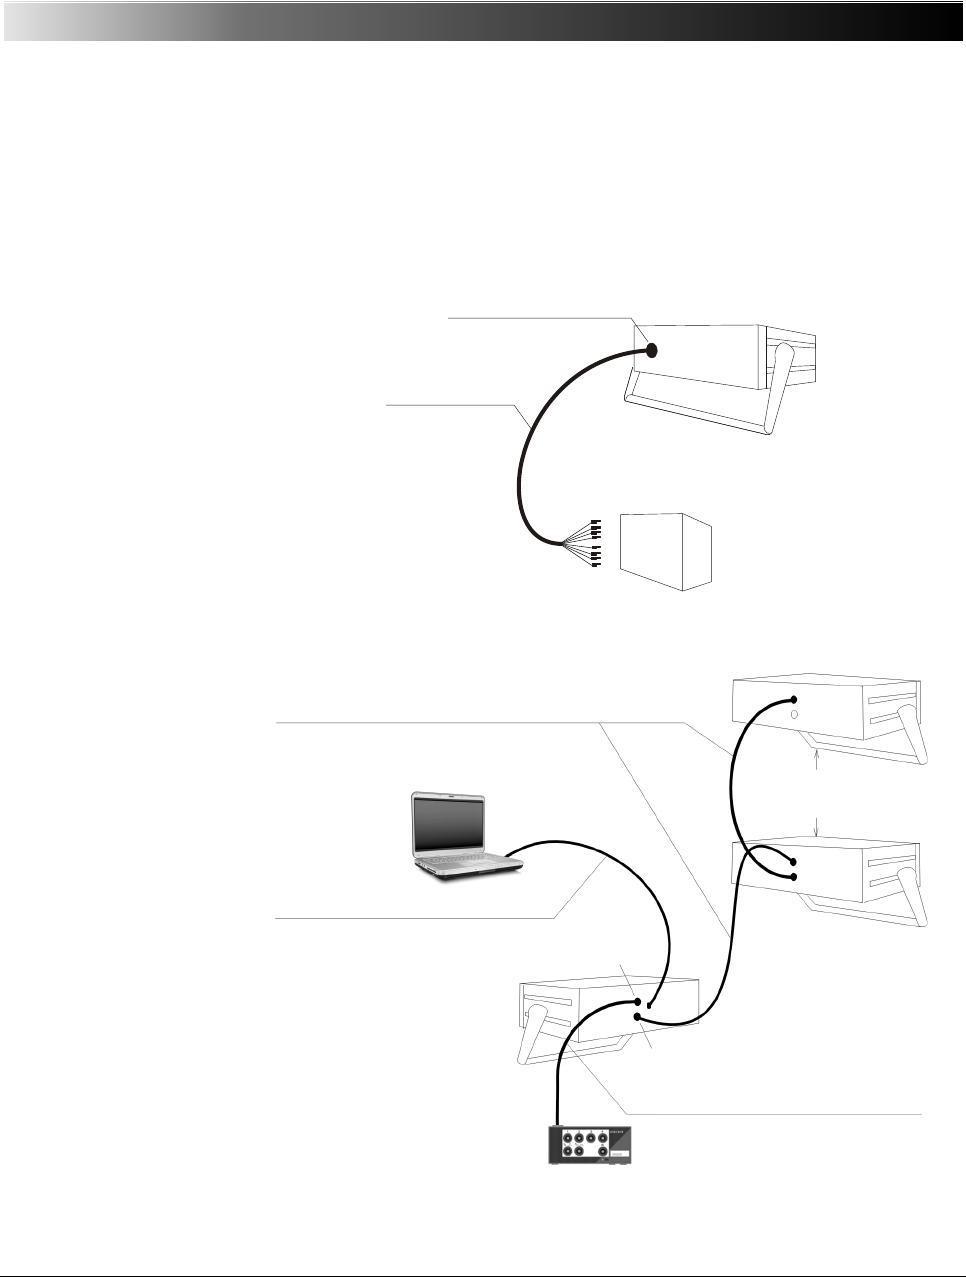 cmc electronic cmc 356 user manual download page 127 rh rsmanuals com Vision System Telent plc